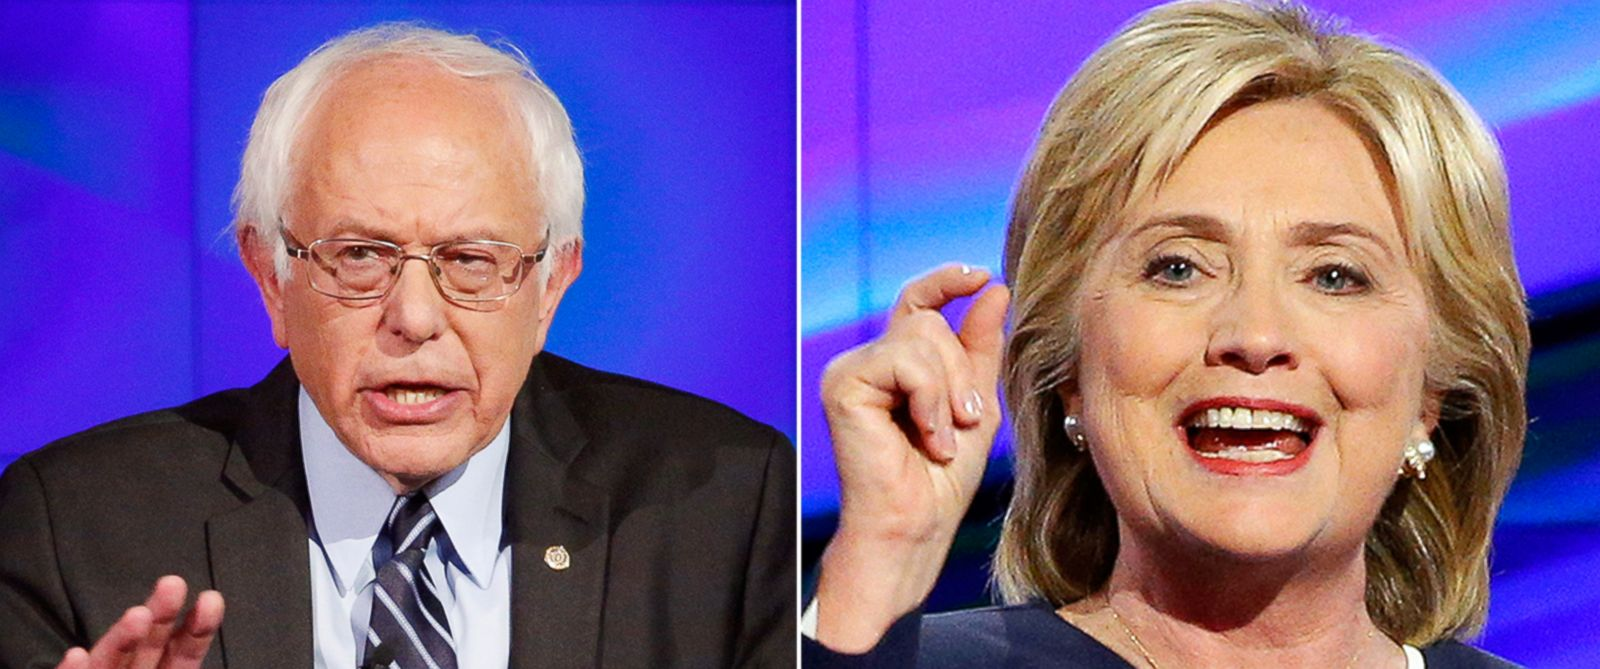 PHOTO: Bernie Sanders and Hillary Clinton during the CNN Democratic presidential debate in Las Vegas, Oct. 13, 2015.